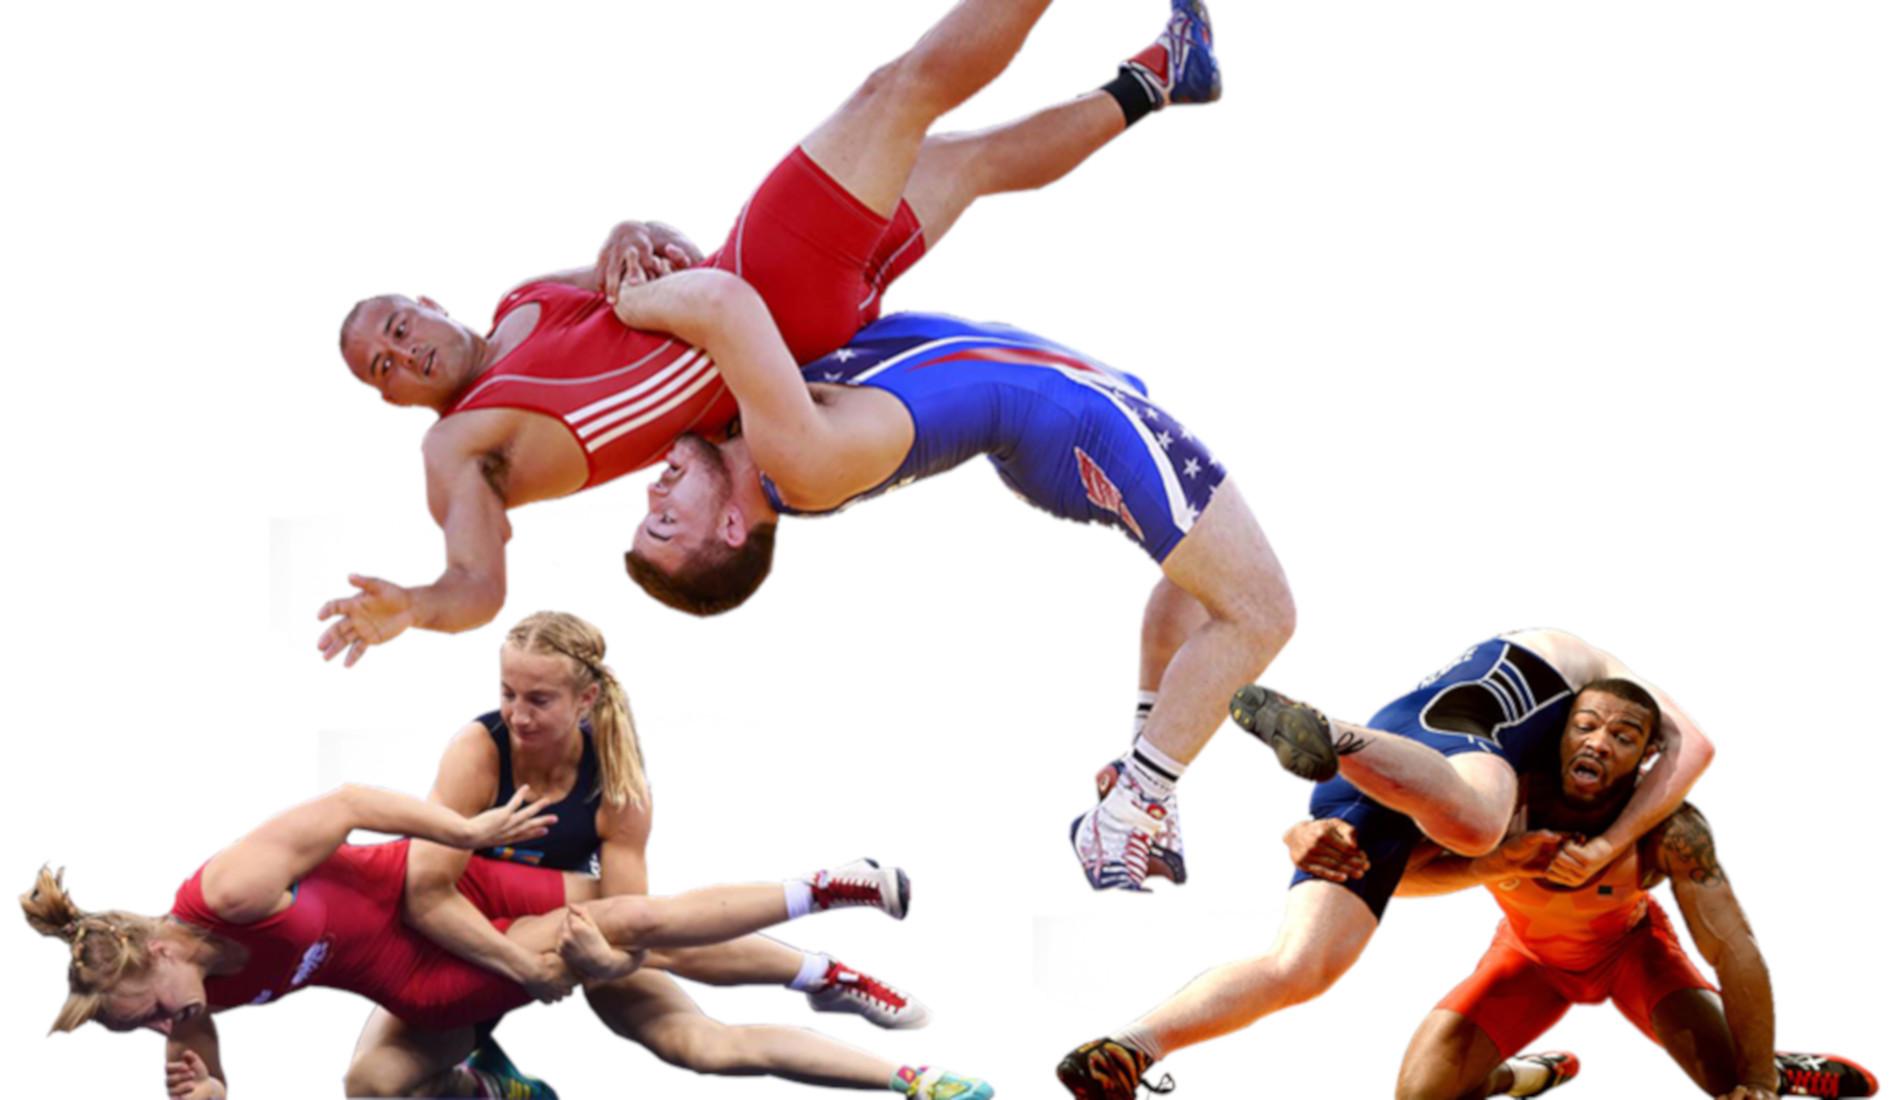 lucha olimpica en madrid